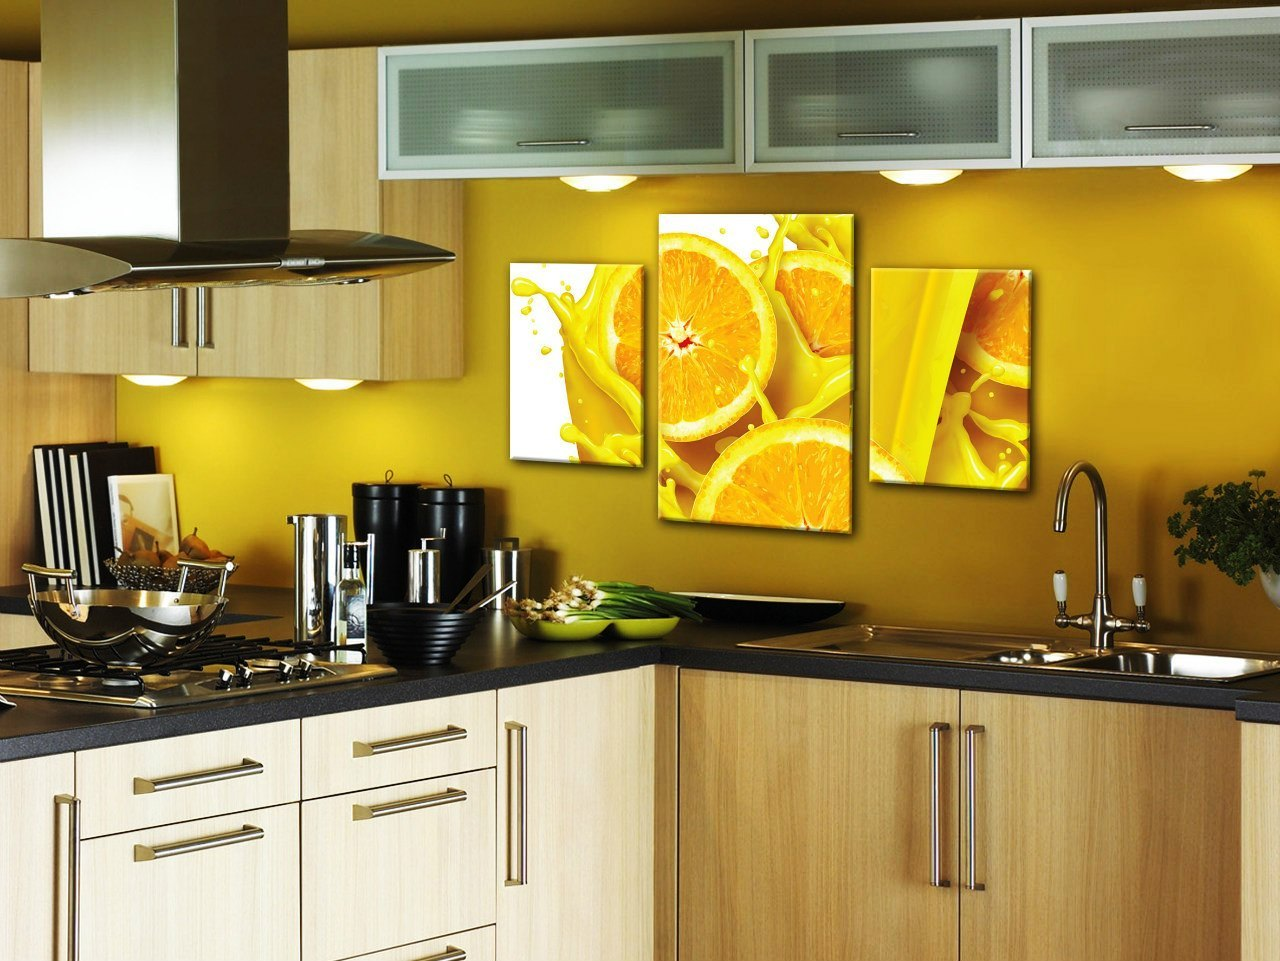 Картинки для кухни на стену